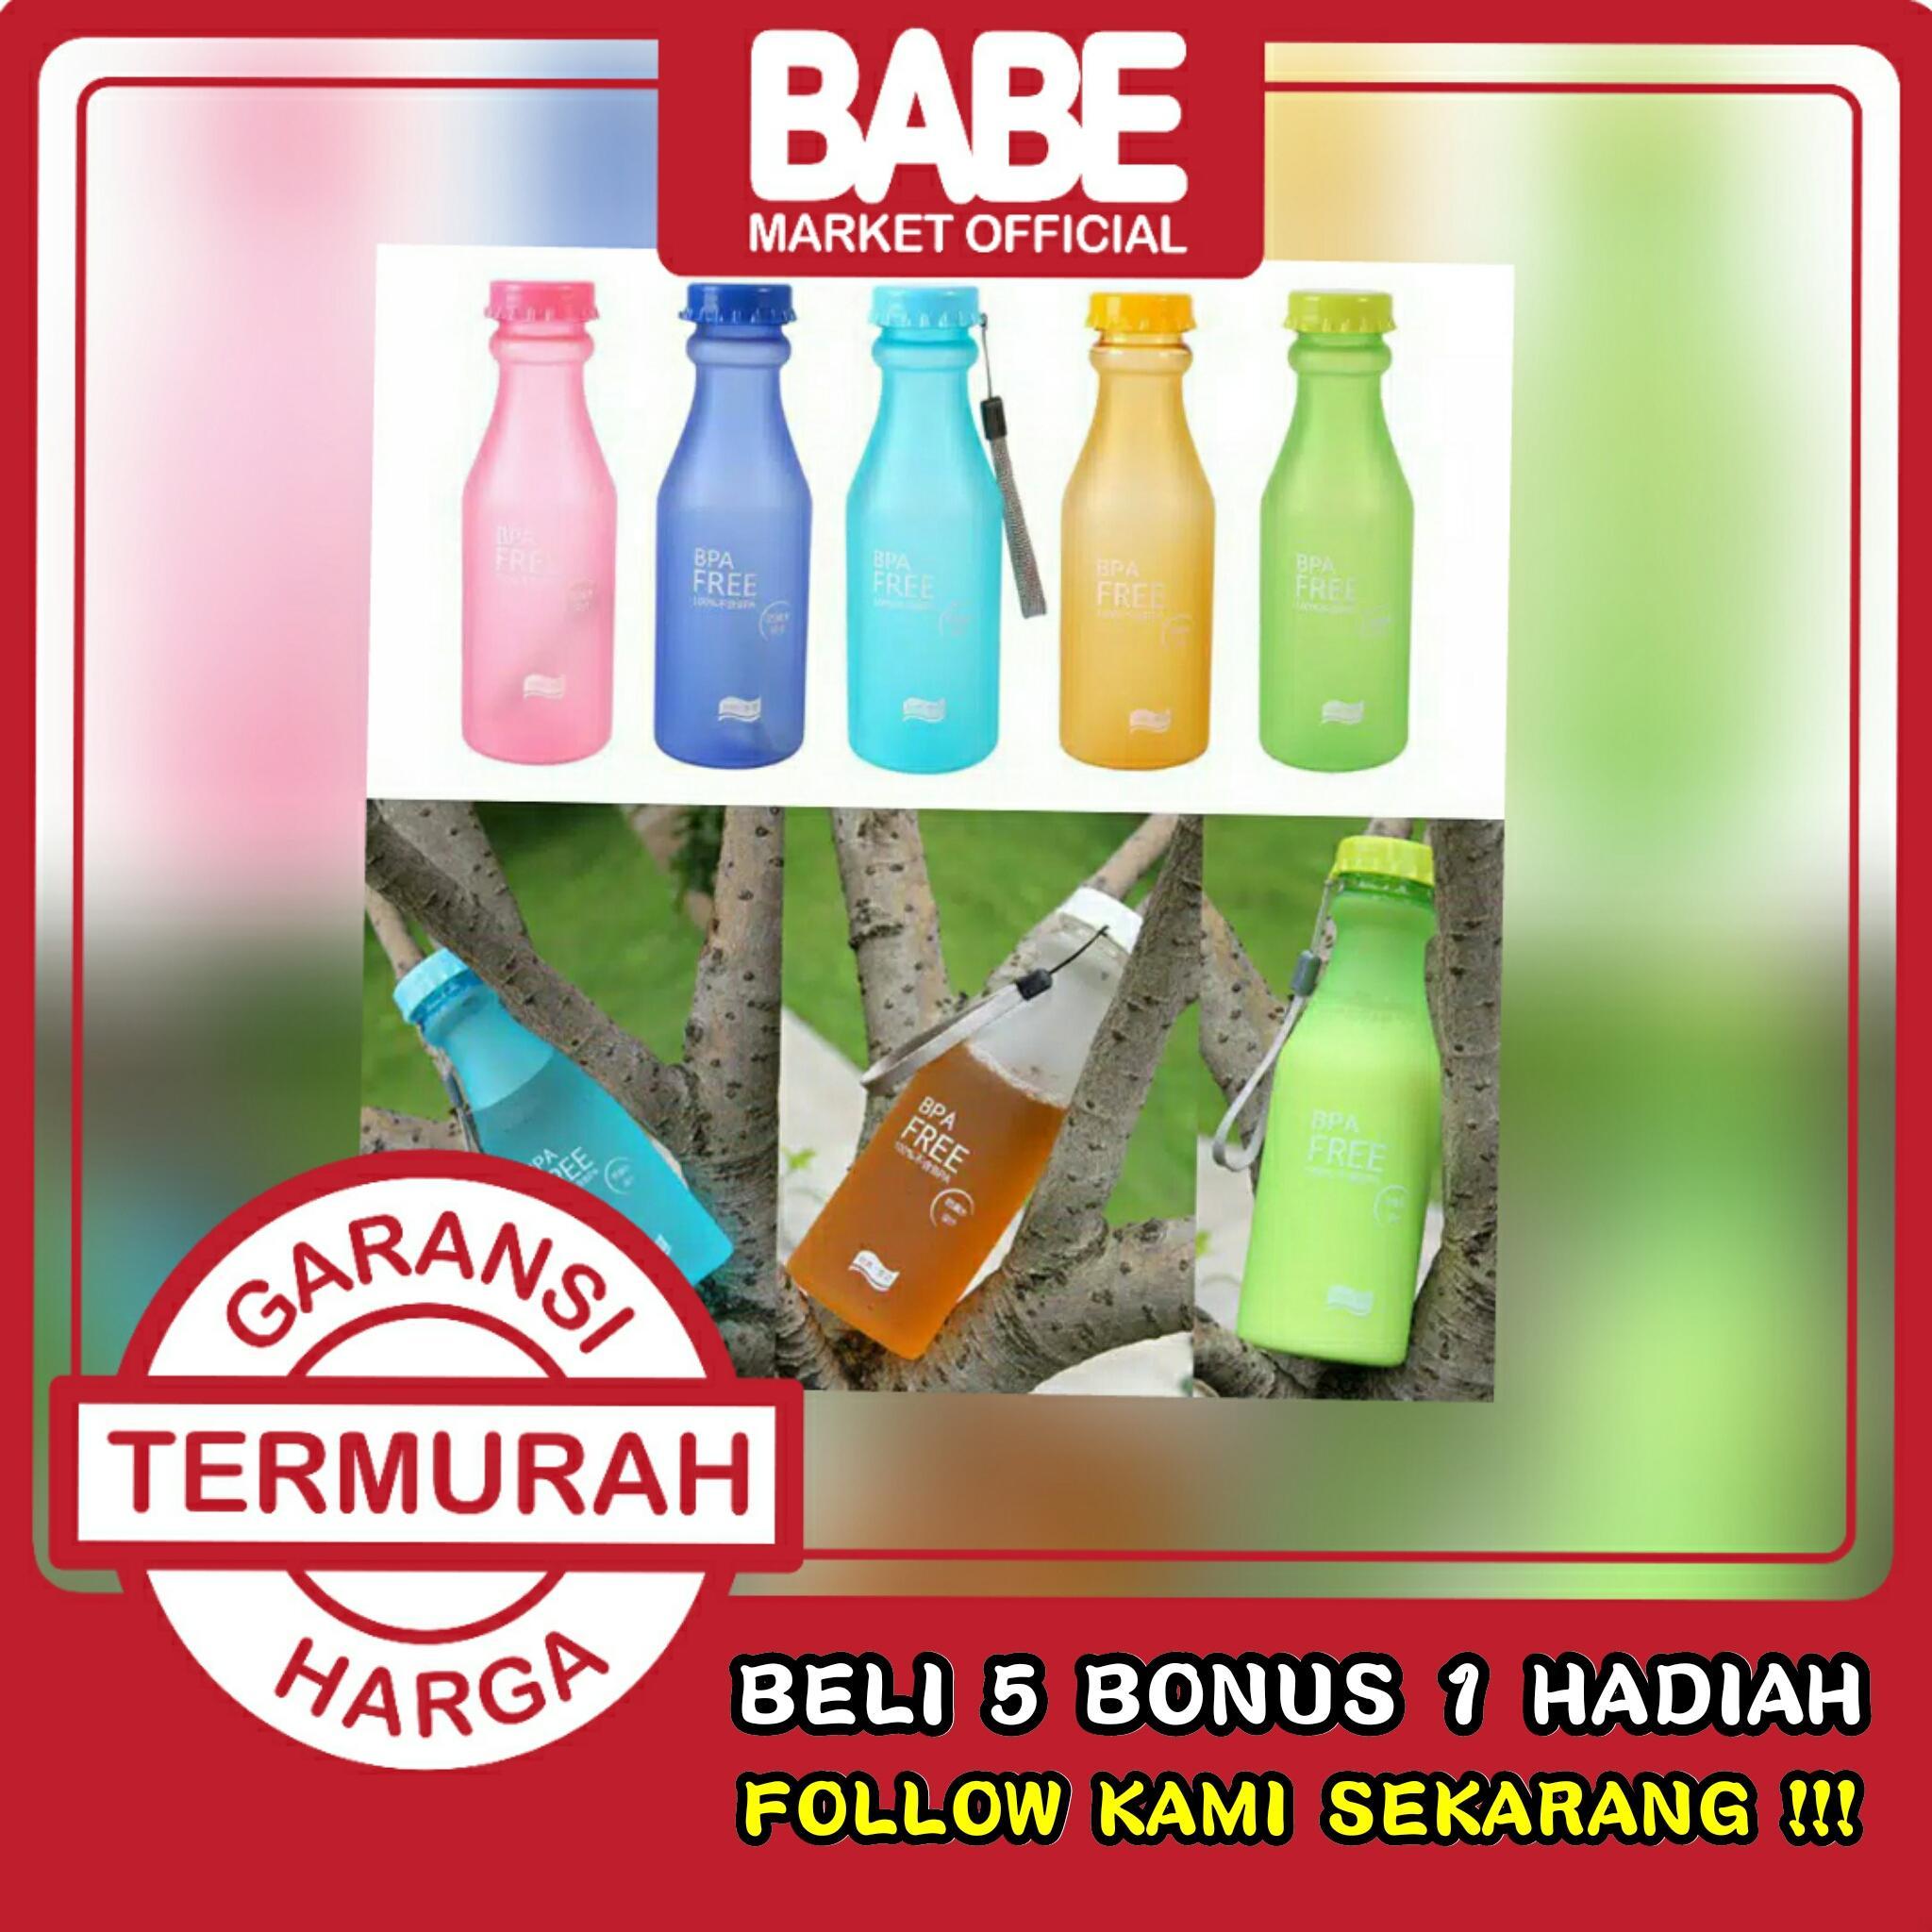 BABEMARKET - Botol Minum BPA FREE DOFF / Botol Minum / Botol Minum Anak / Botol